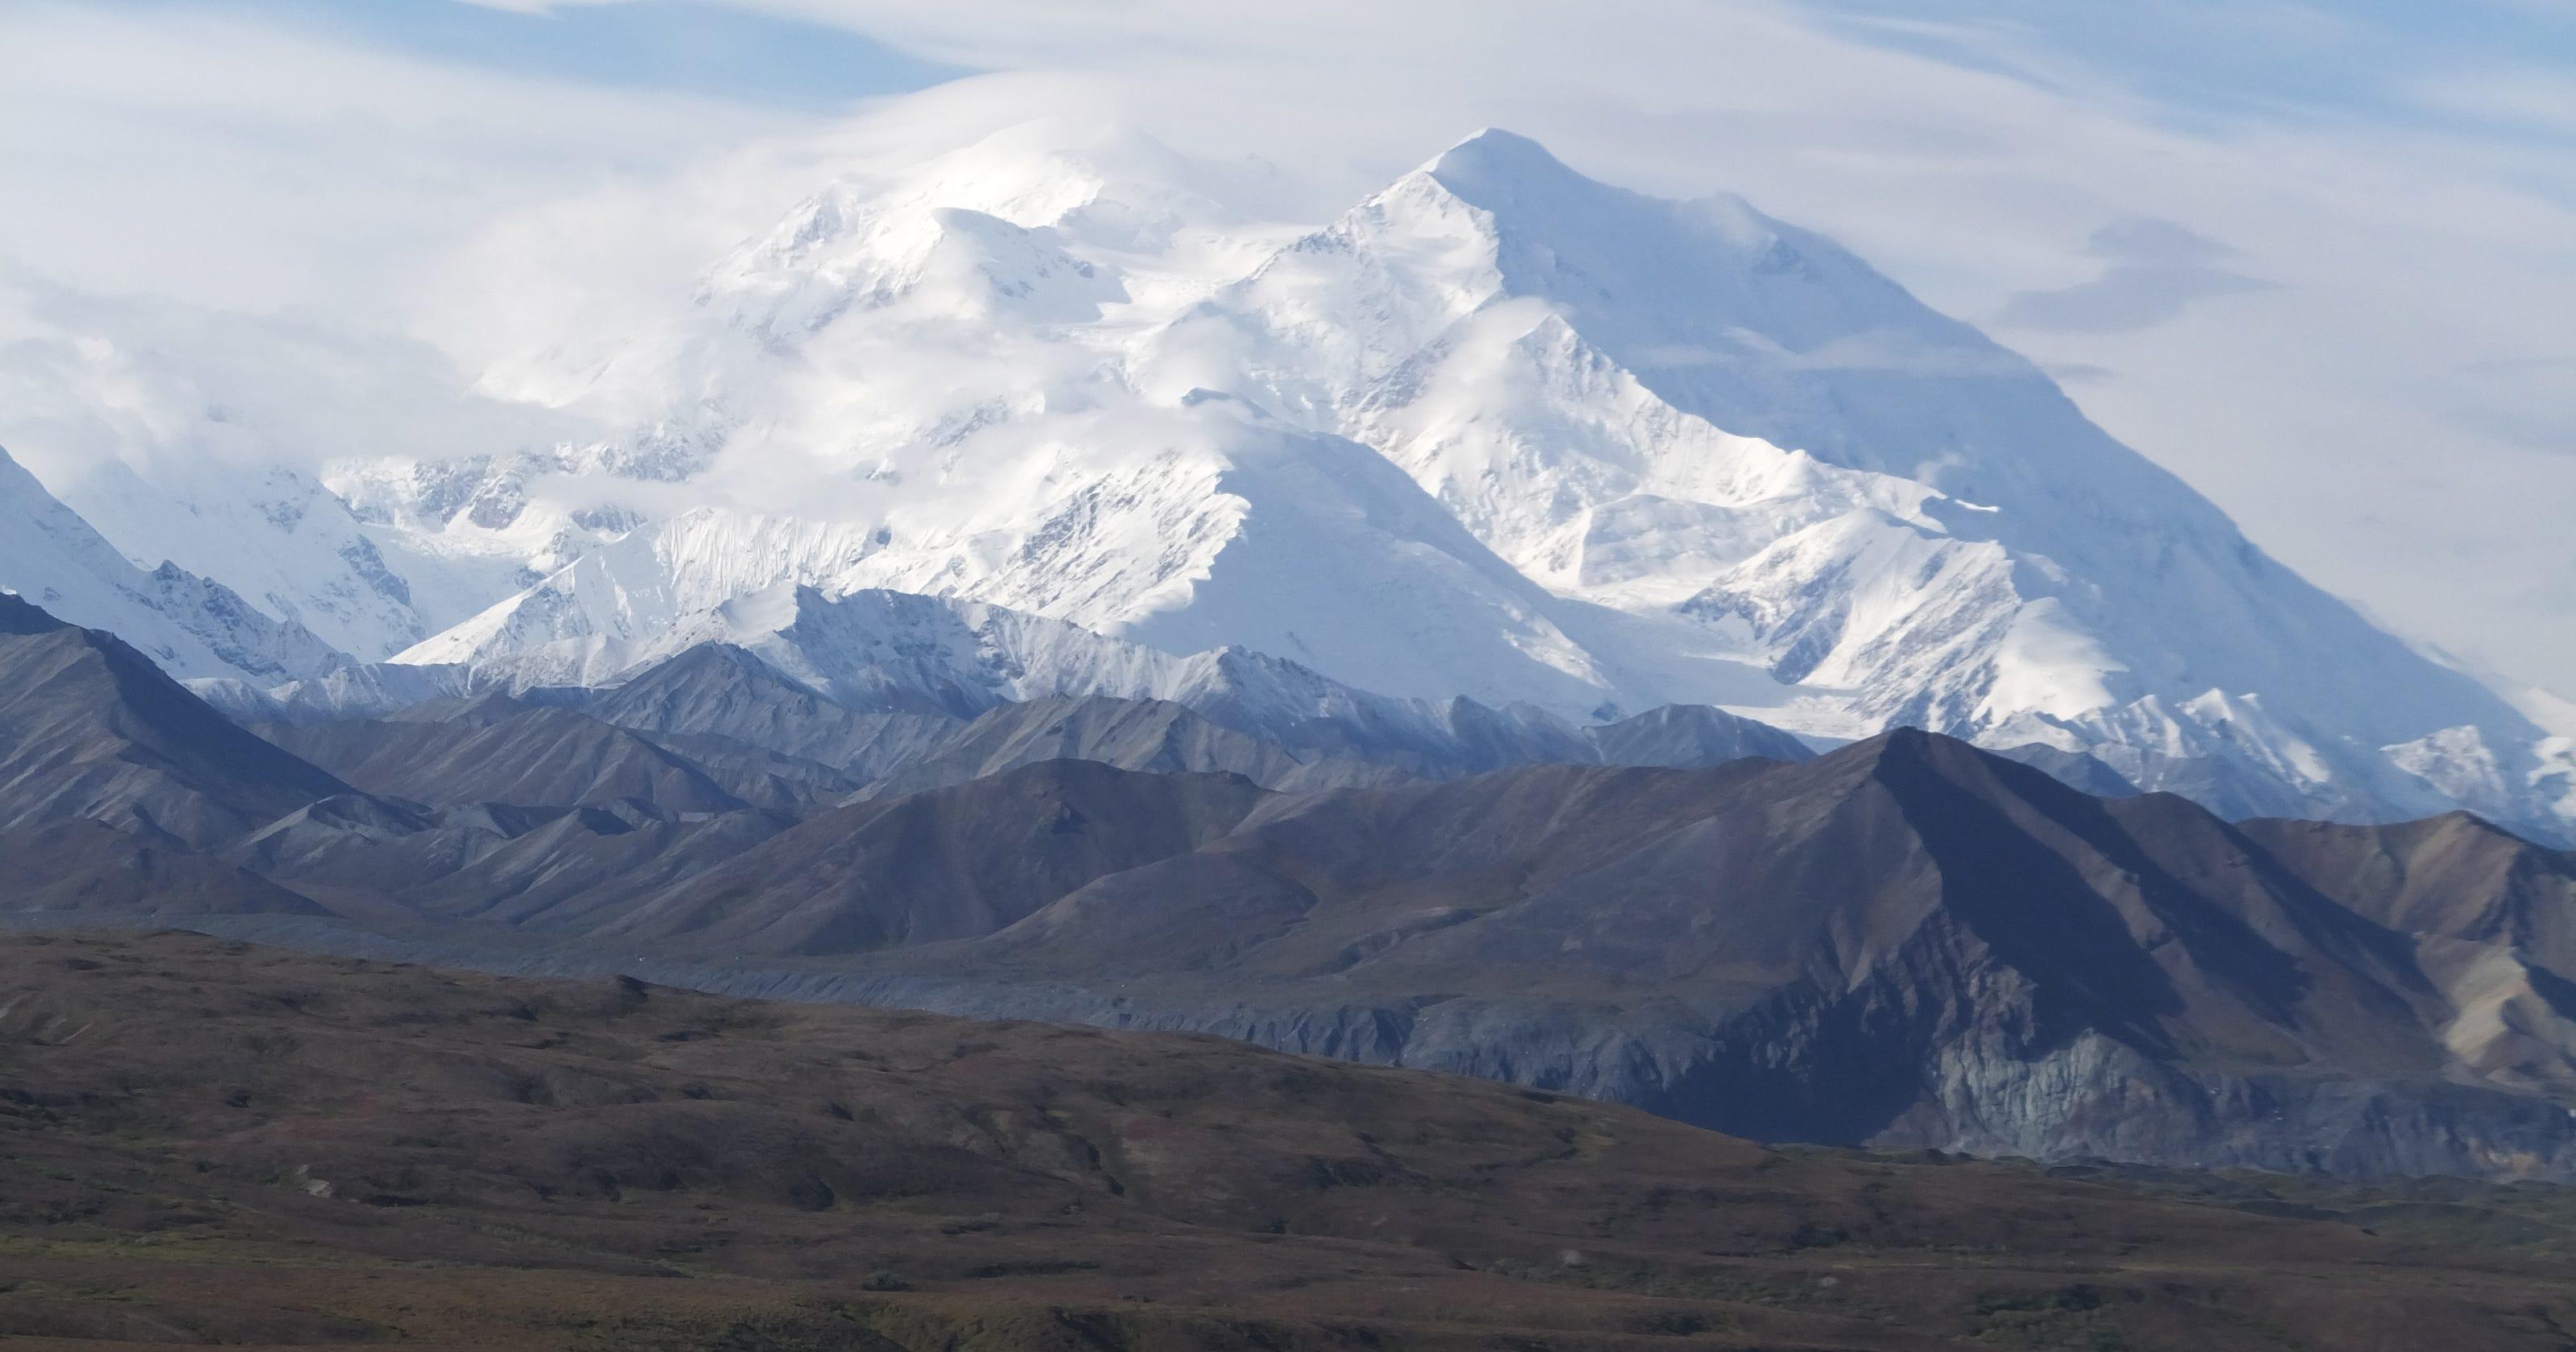 Obama Administration Renames Mount Mckinley To Denali - Mt-mckinley-on-us-map